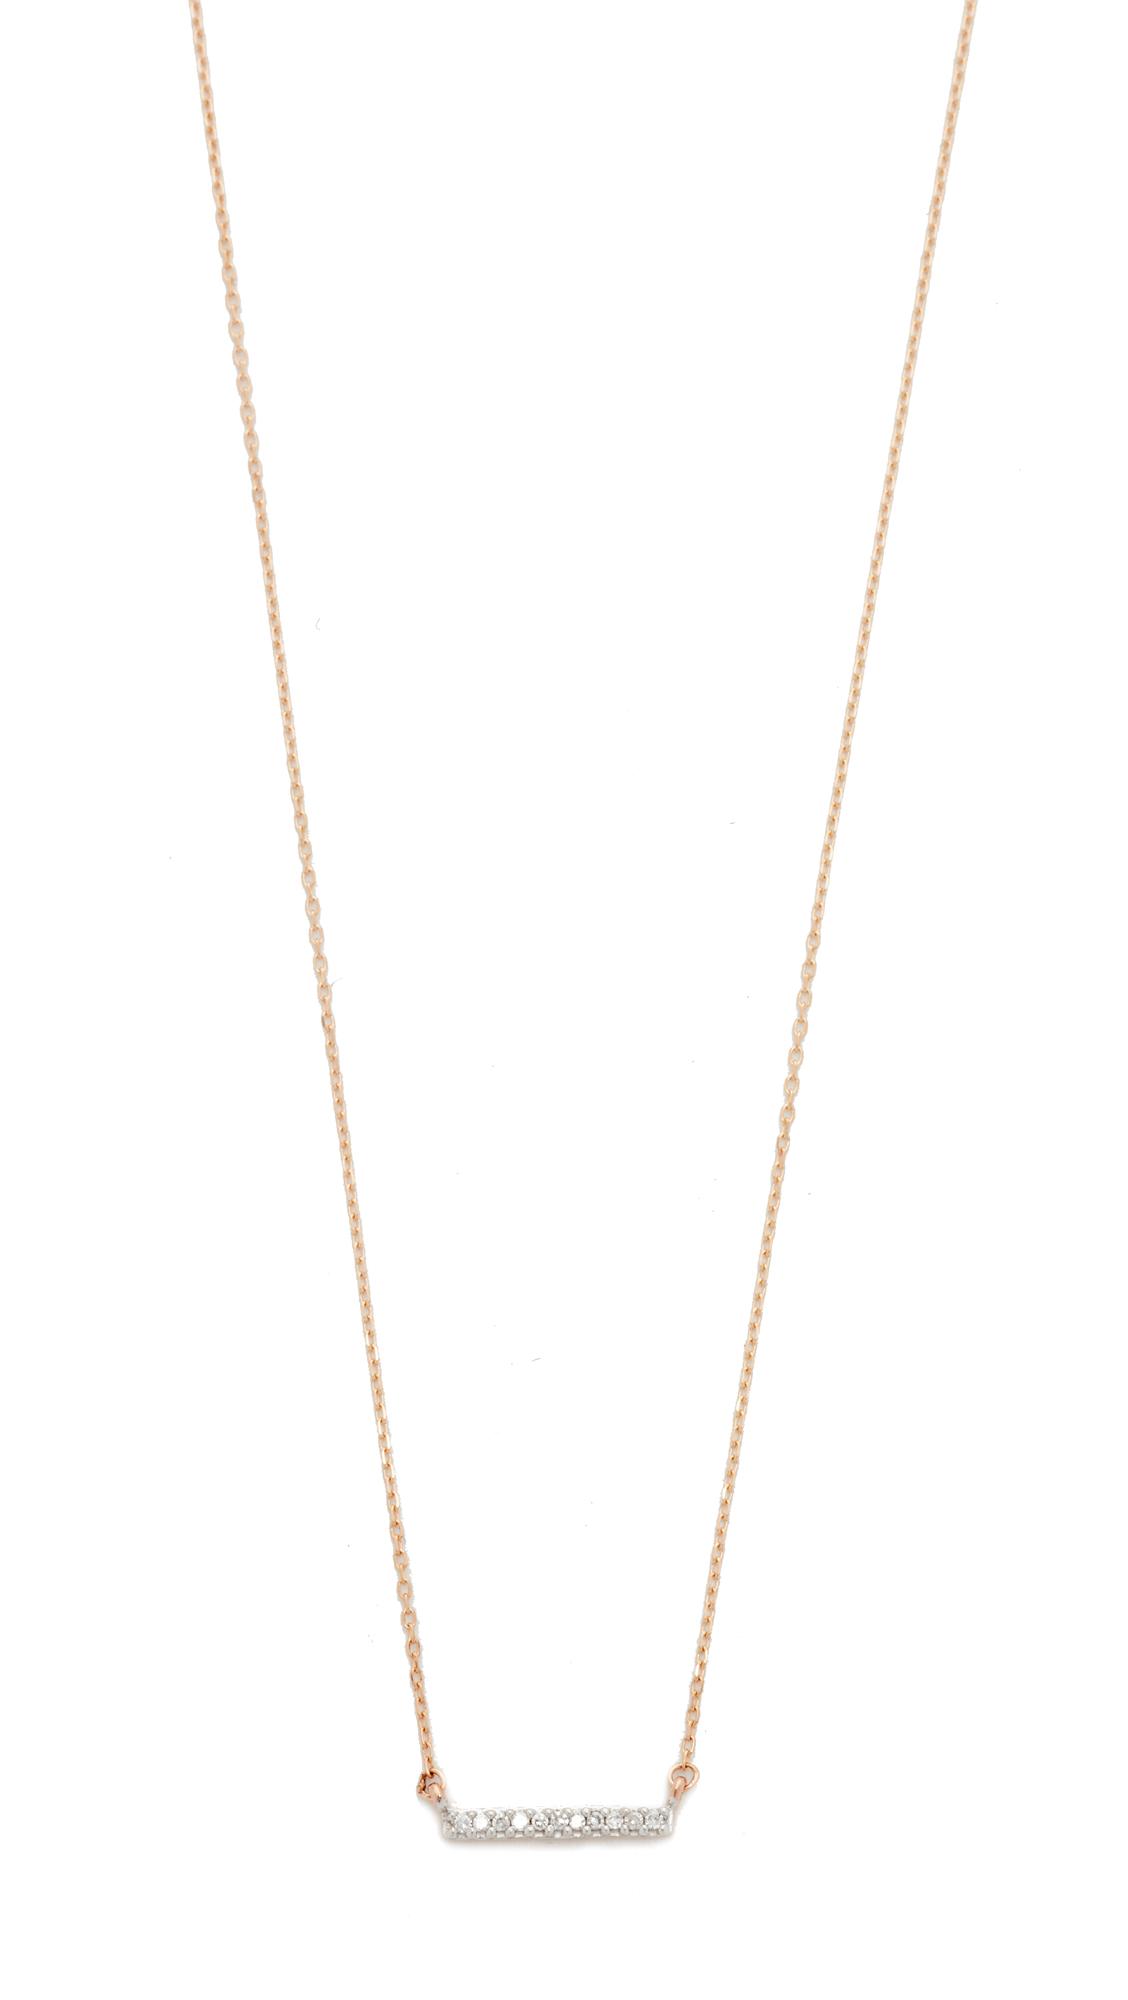 Adina Reyter 14k Gold Pave Bar Necklace - Rose Gold